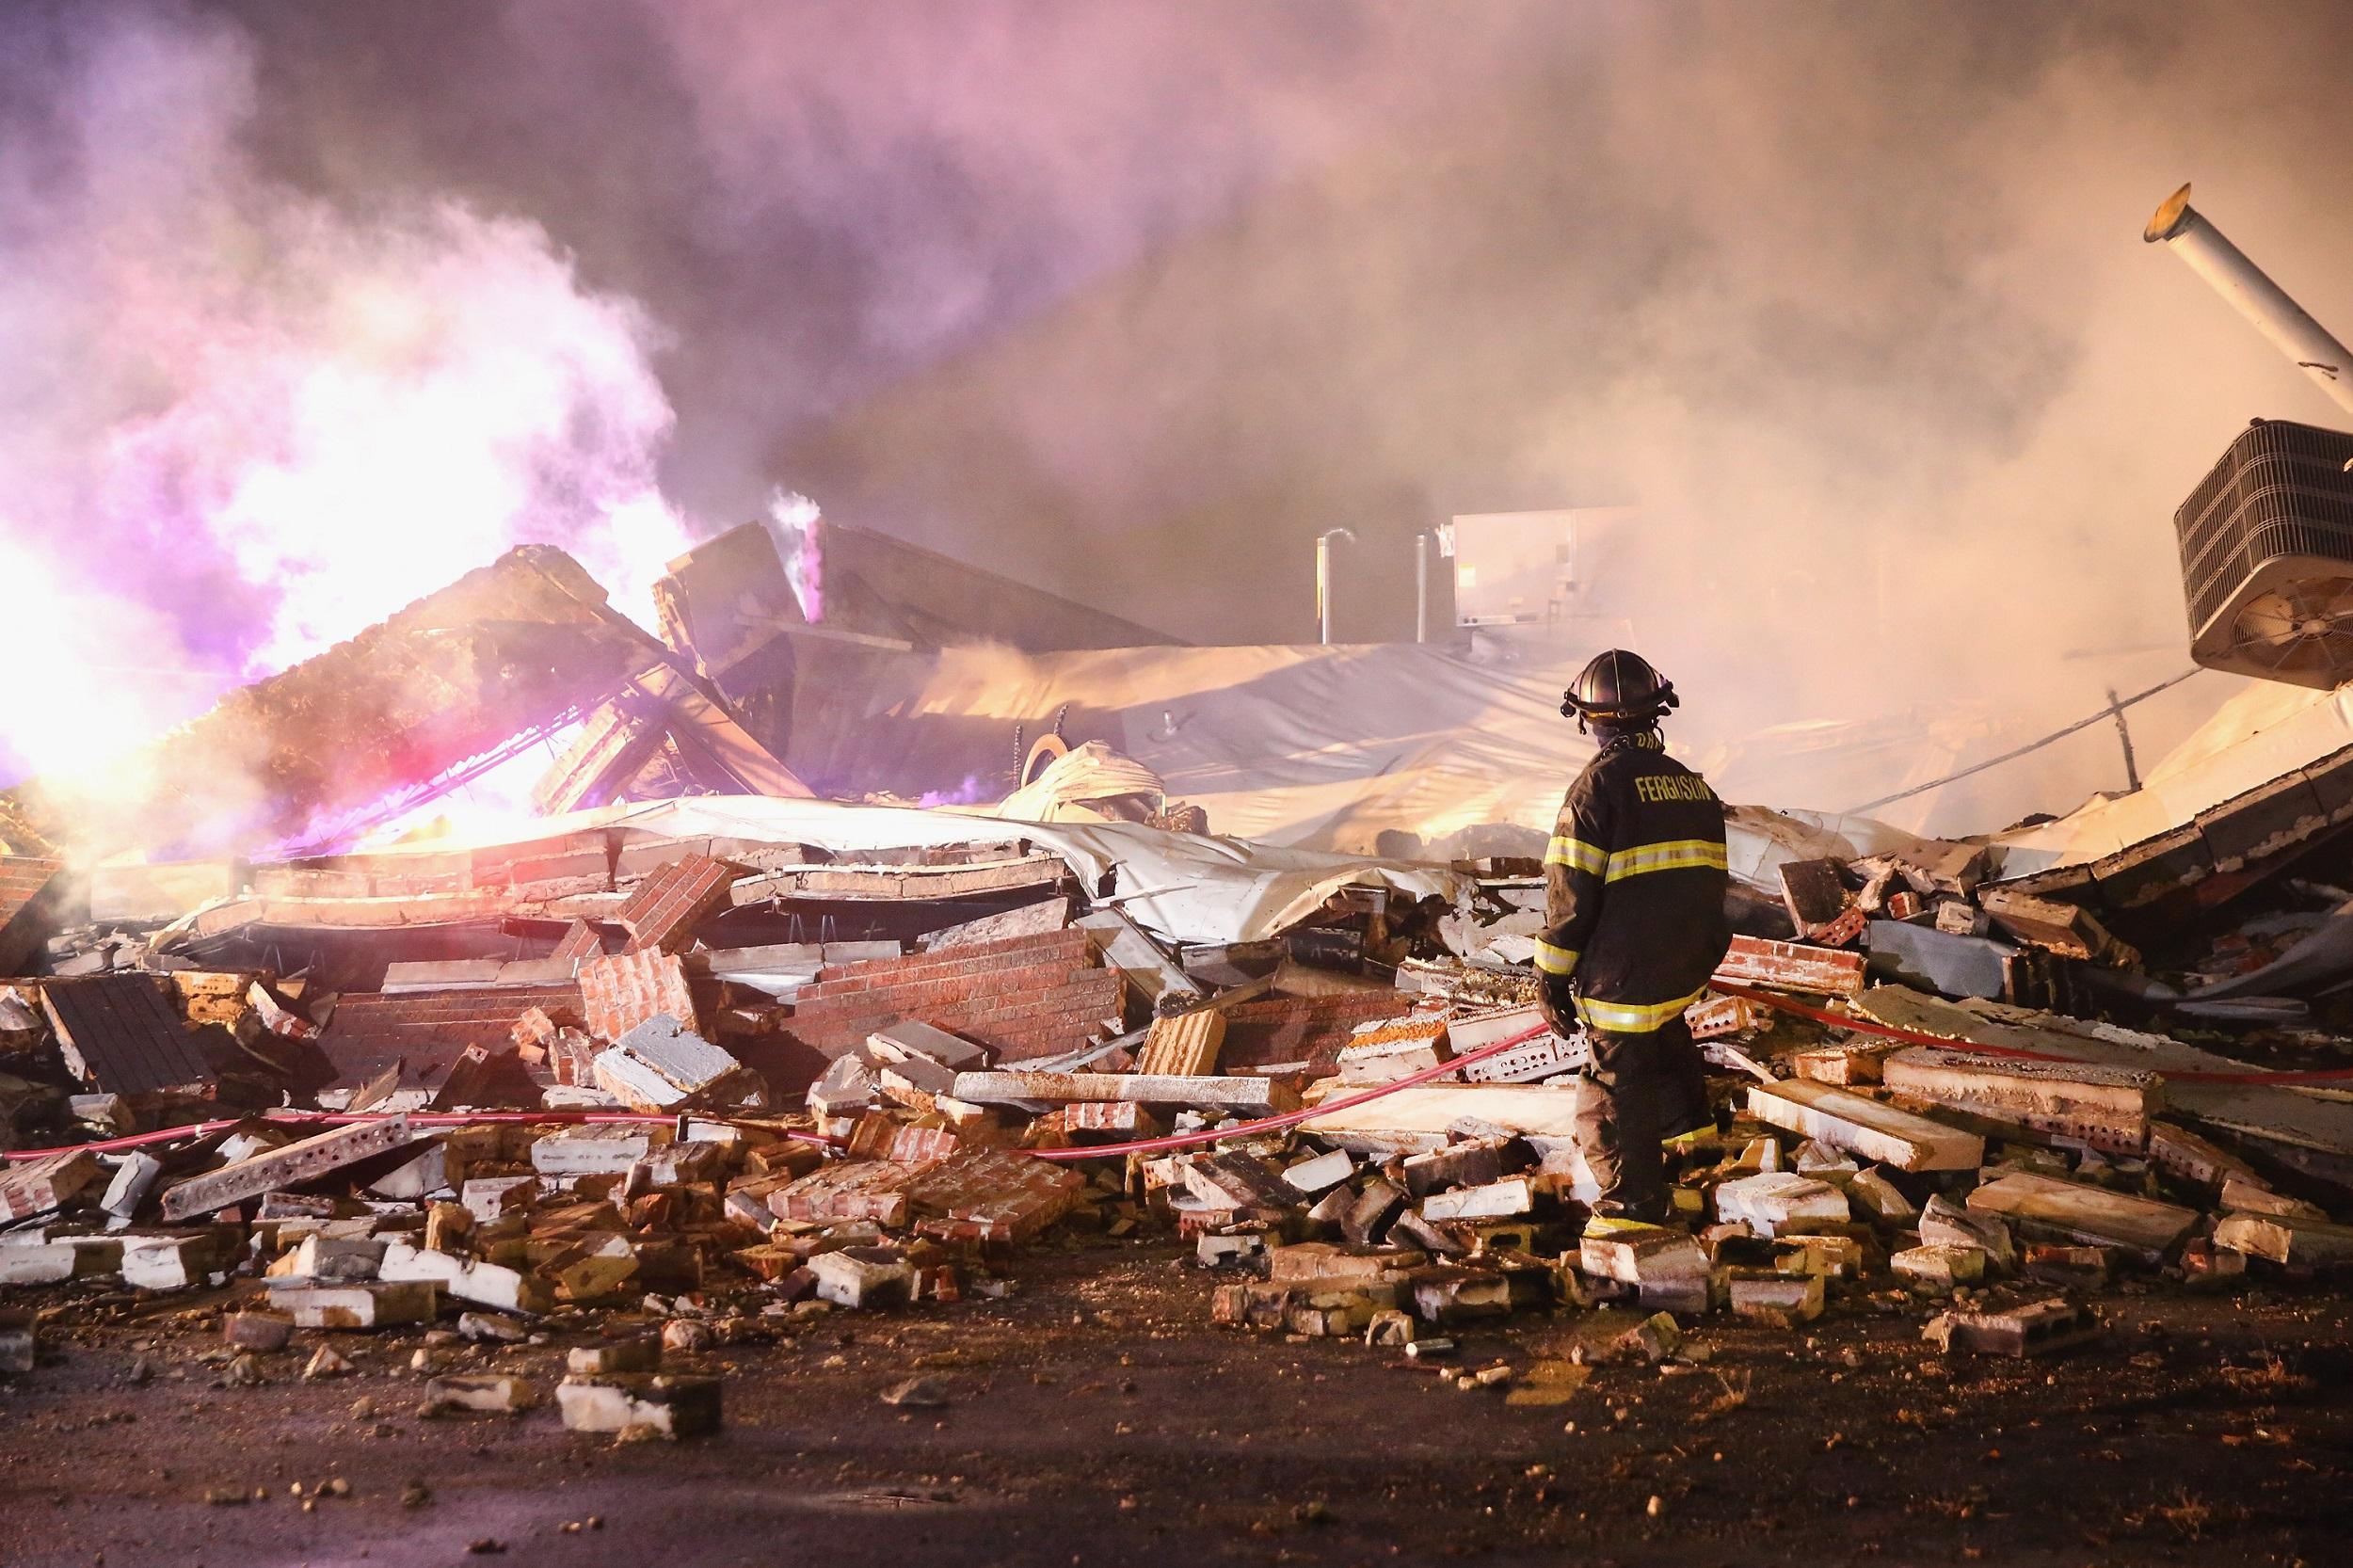 Ferguson damage Getty Images/Scott Olson